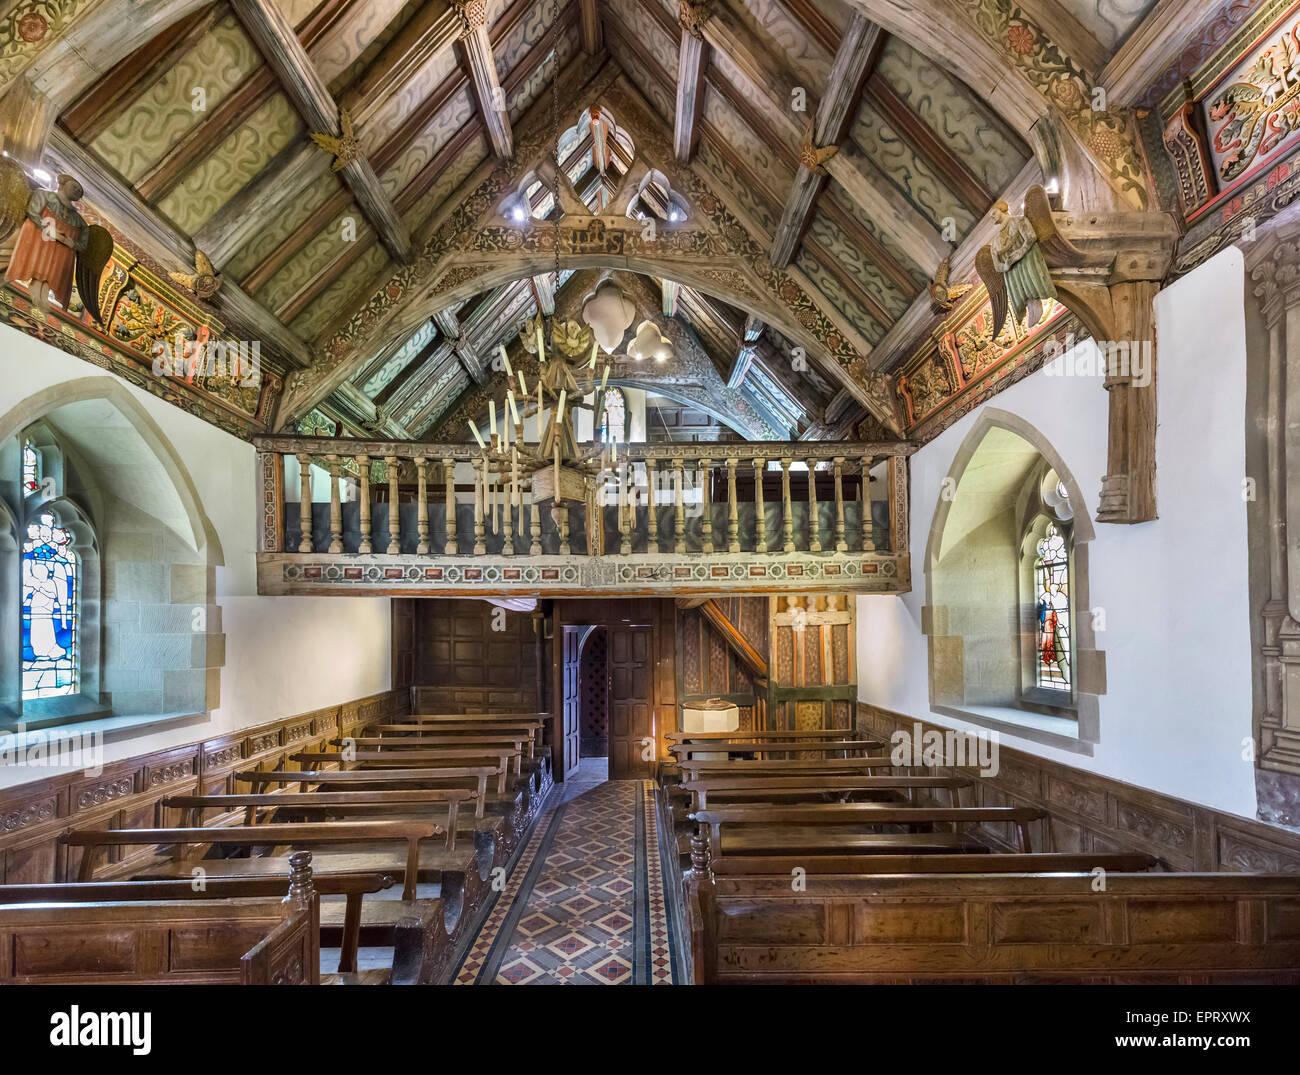 The ornate interior of Rug Chapel, near Corwen, Denbighshire, Wales, UK - Stock Image